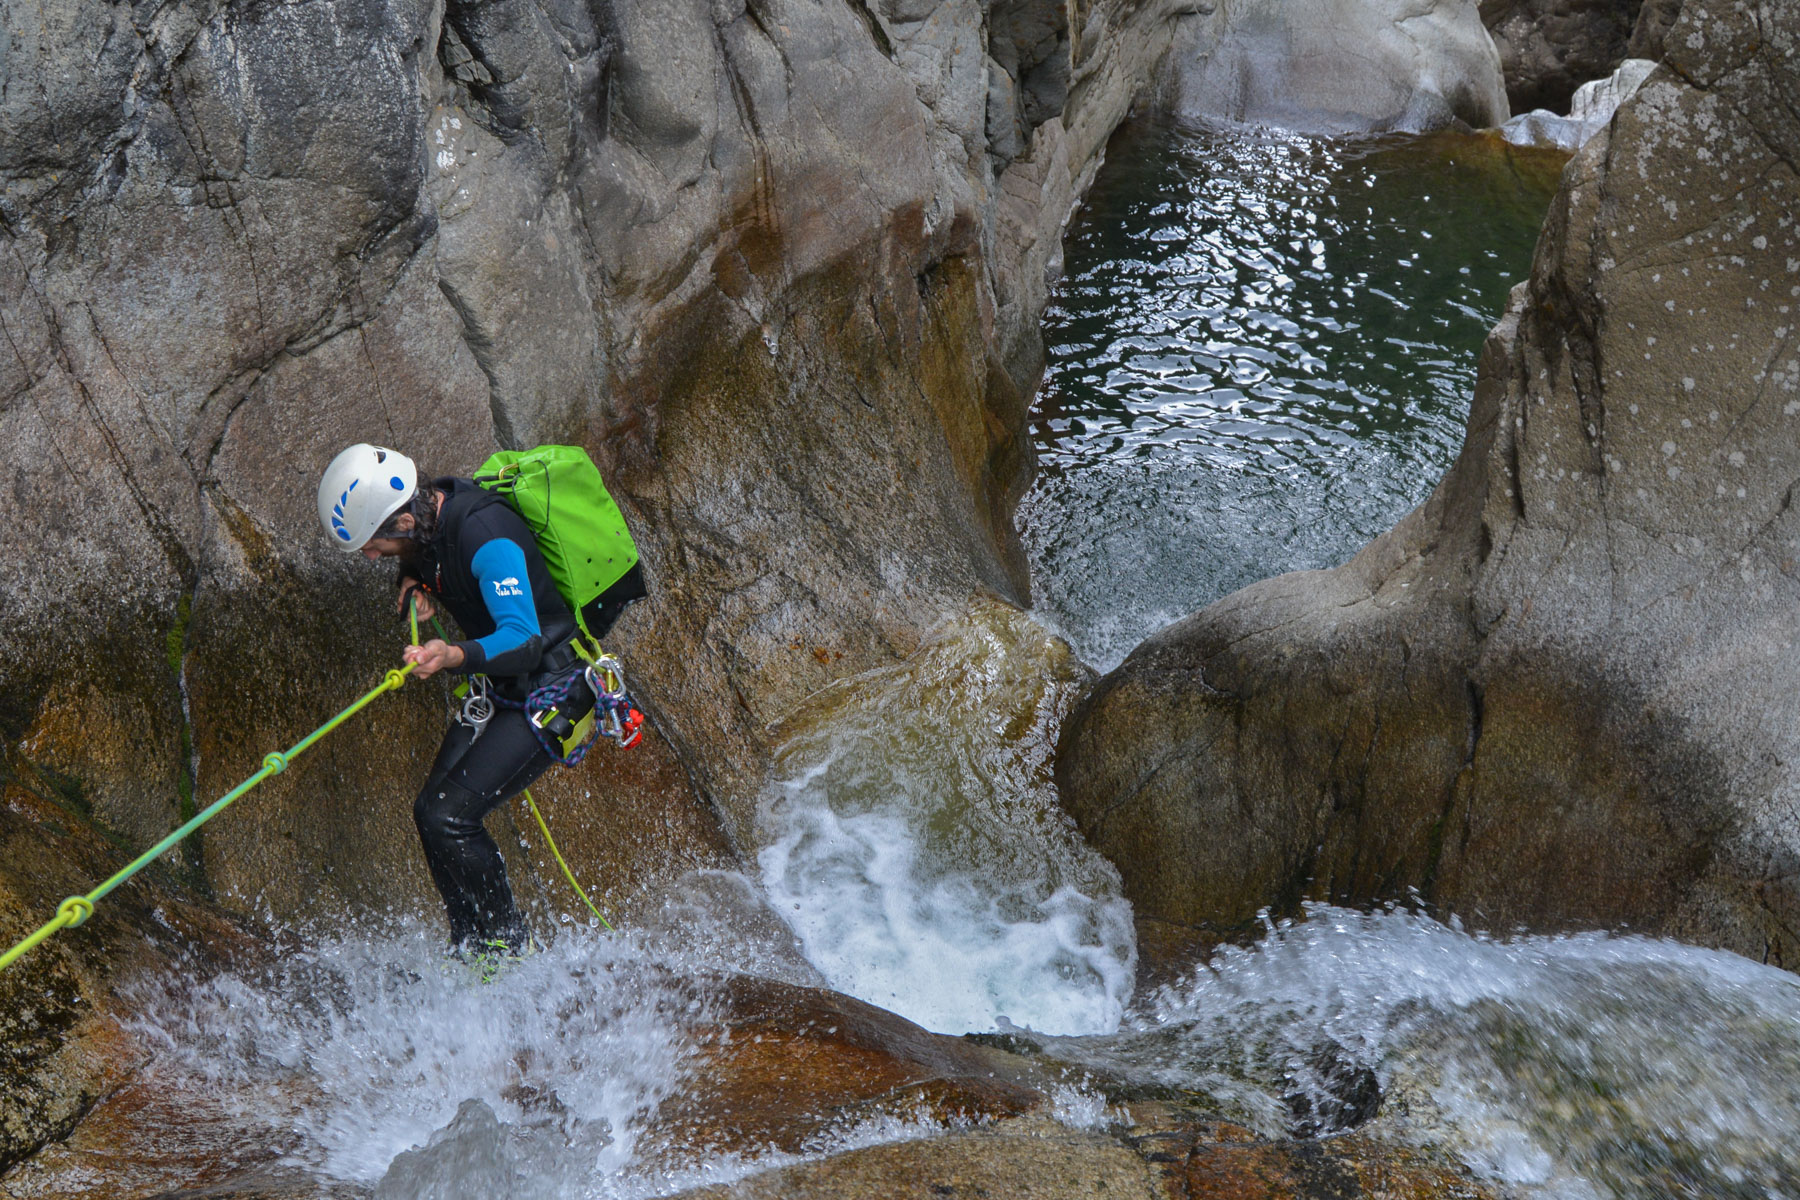 Gorges de Nuria, Catalunya 29